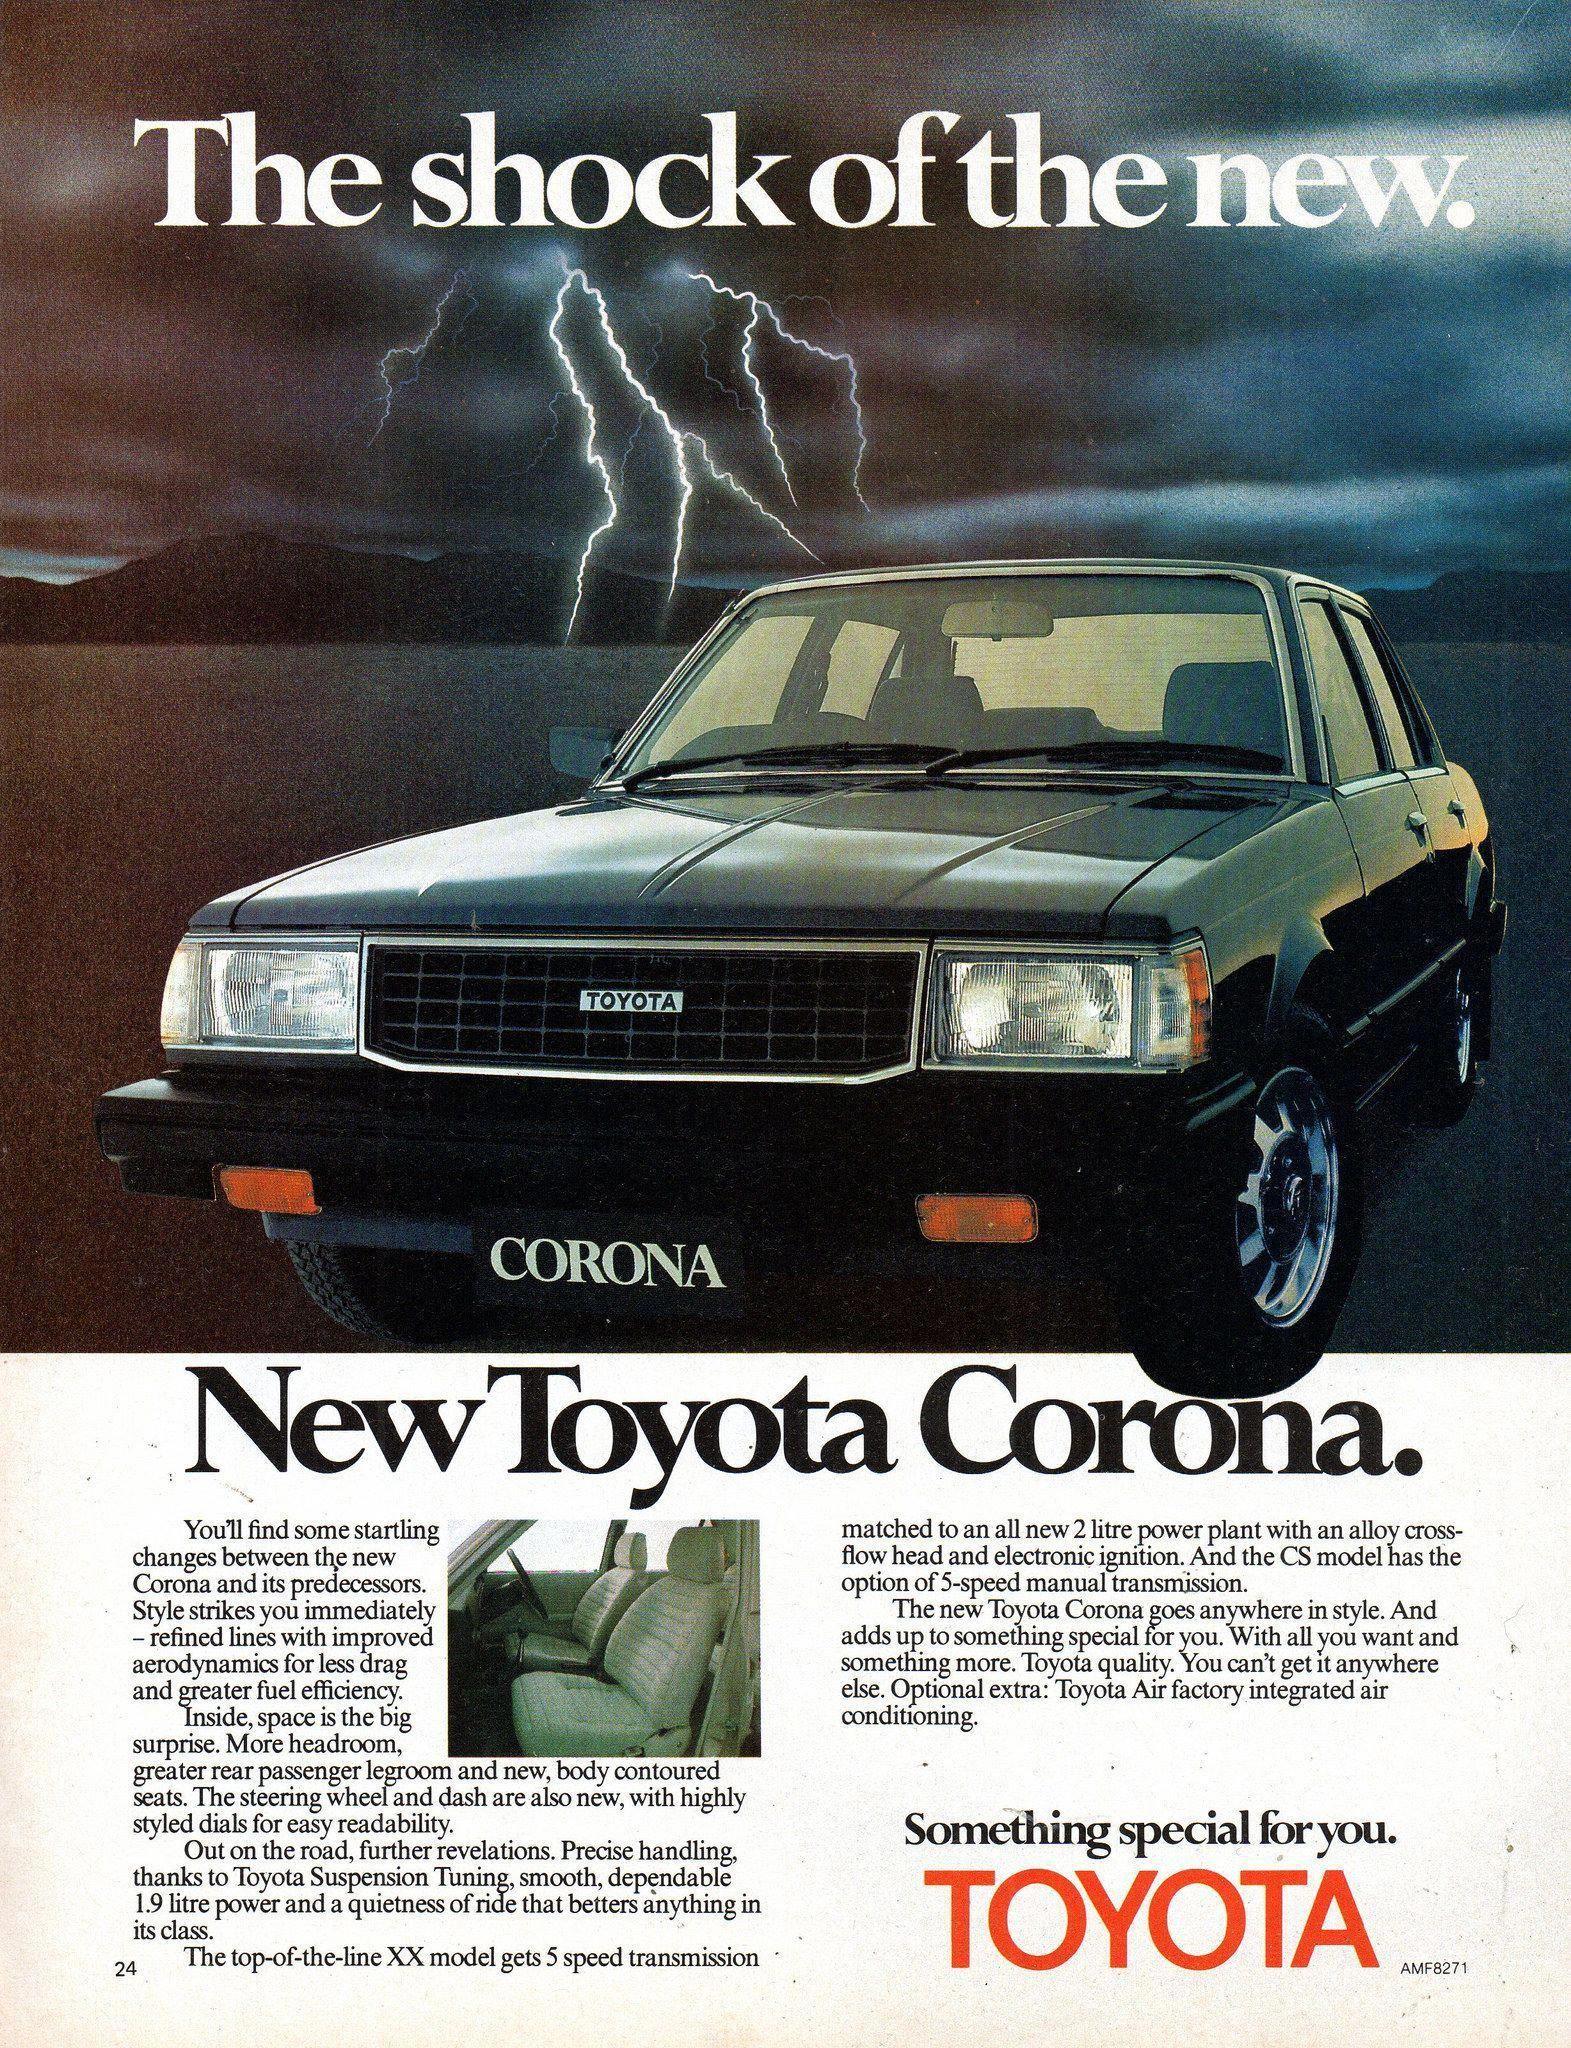 Toyota Classic Cars Inc Toyotaclassiccars Toyota Corona Toyota Classic Japanese Cars